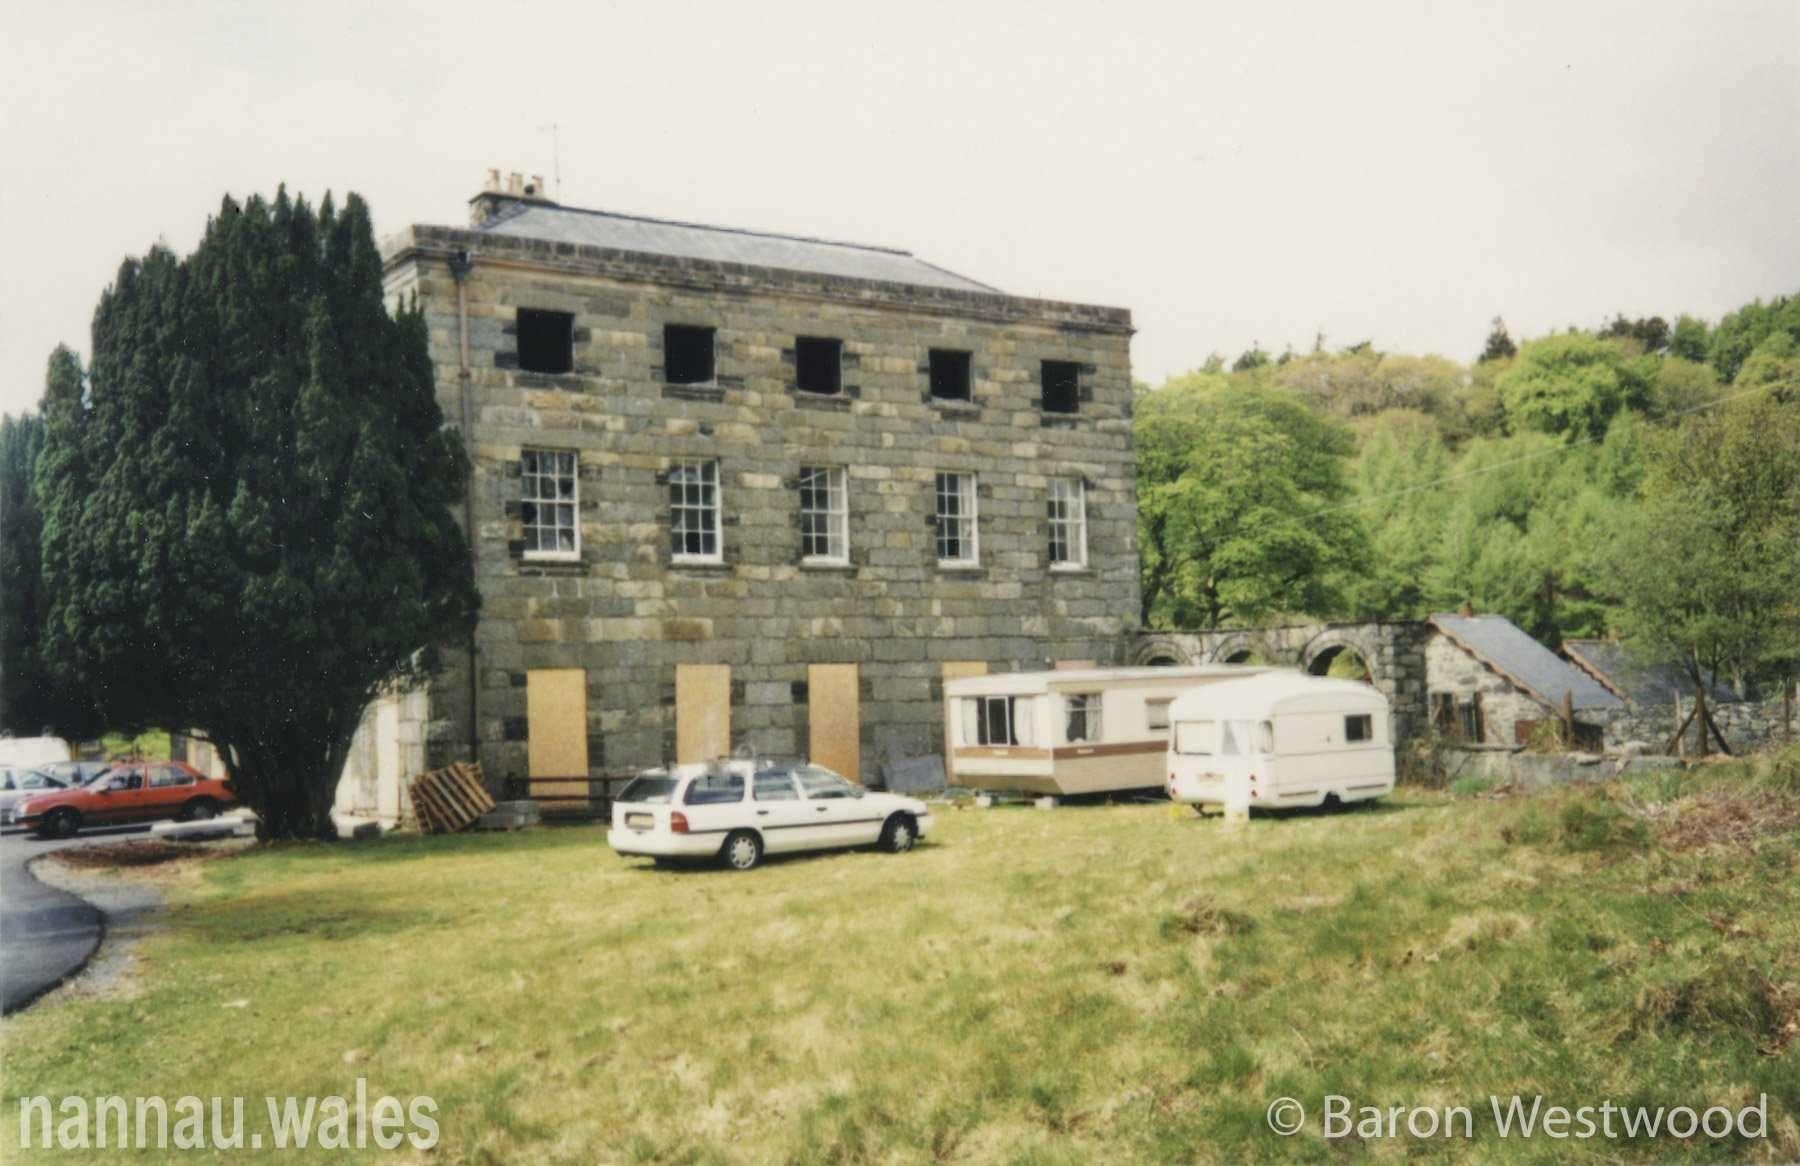 Plas Nannau Hall 1996. Photo © Baron Westwood.